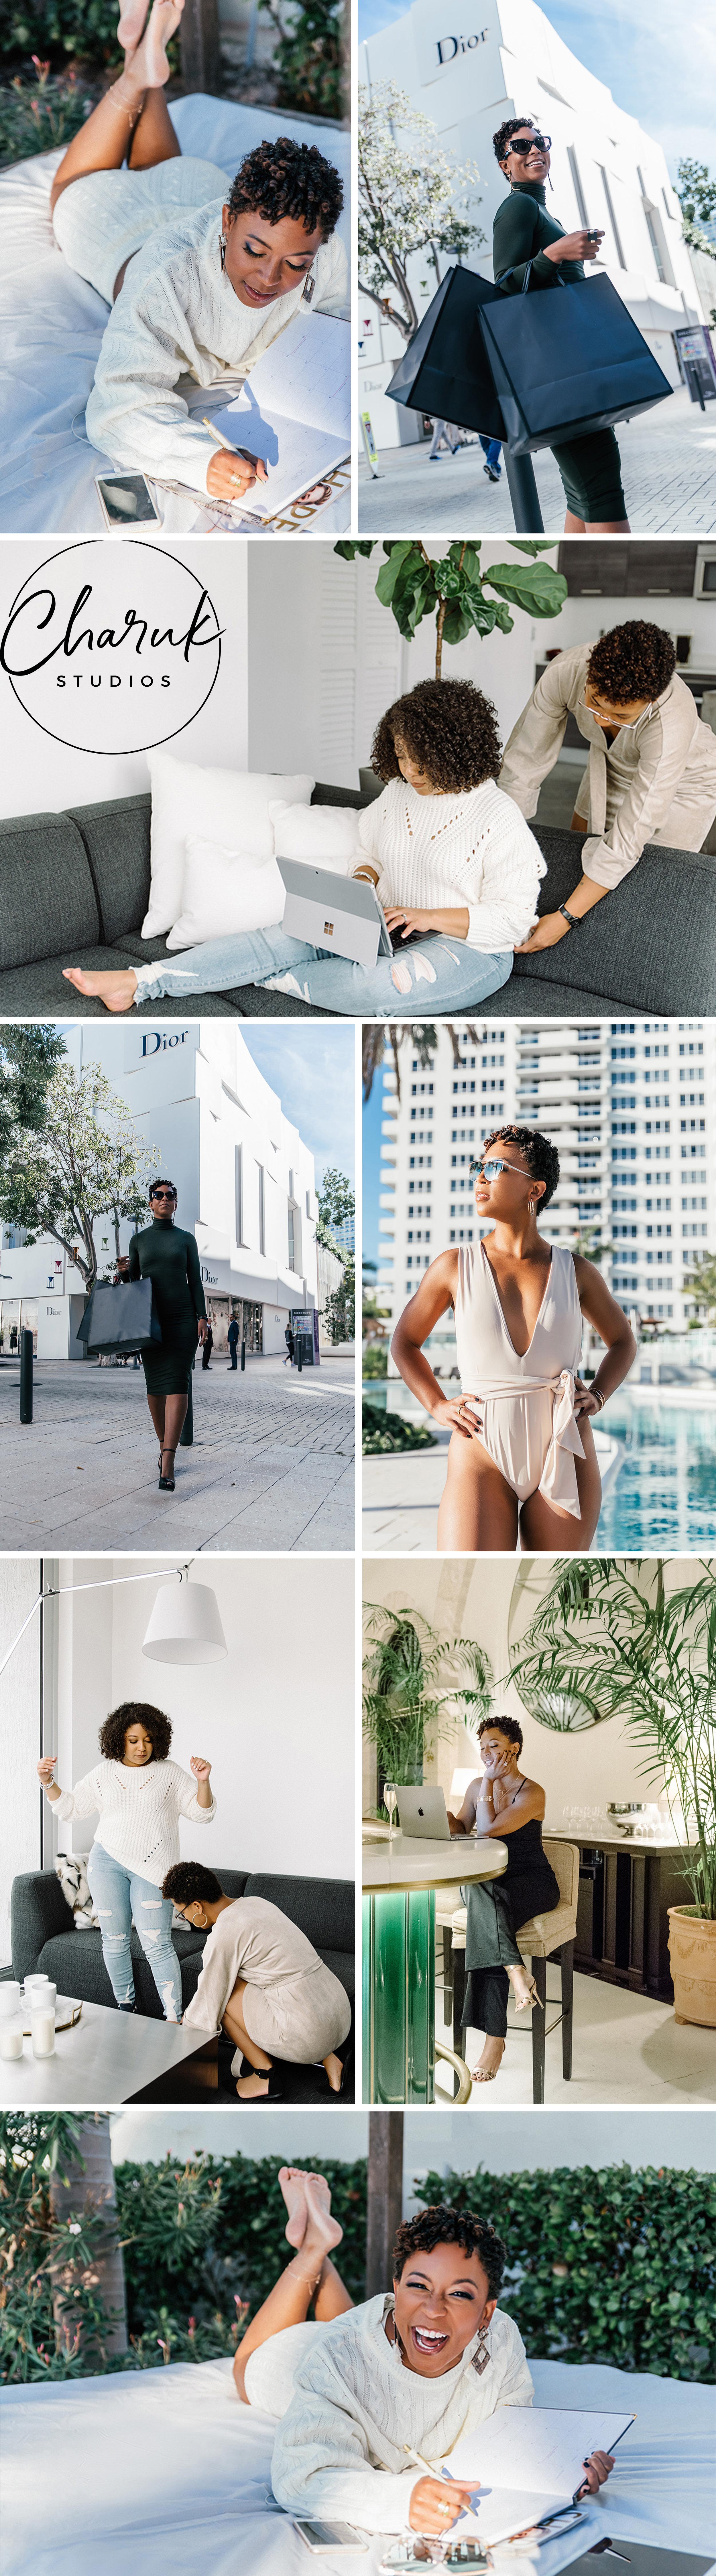 Brand Photo Shoot for Image Consultant Shana Robinson by Charuk Studios